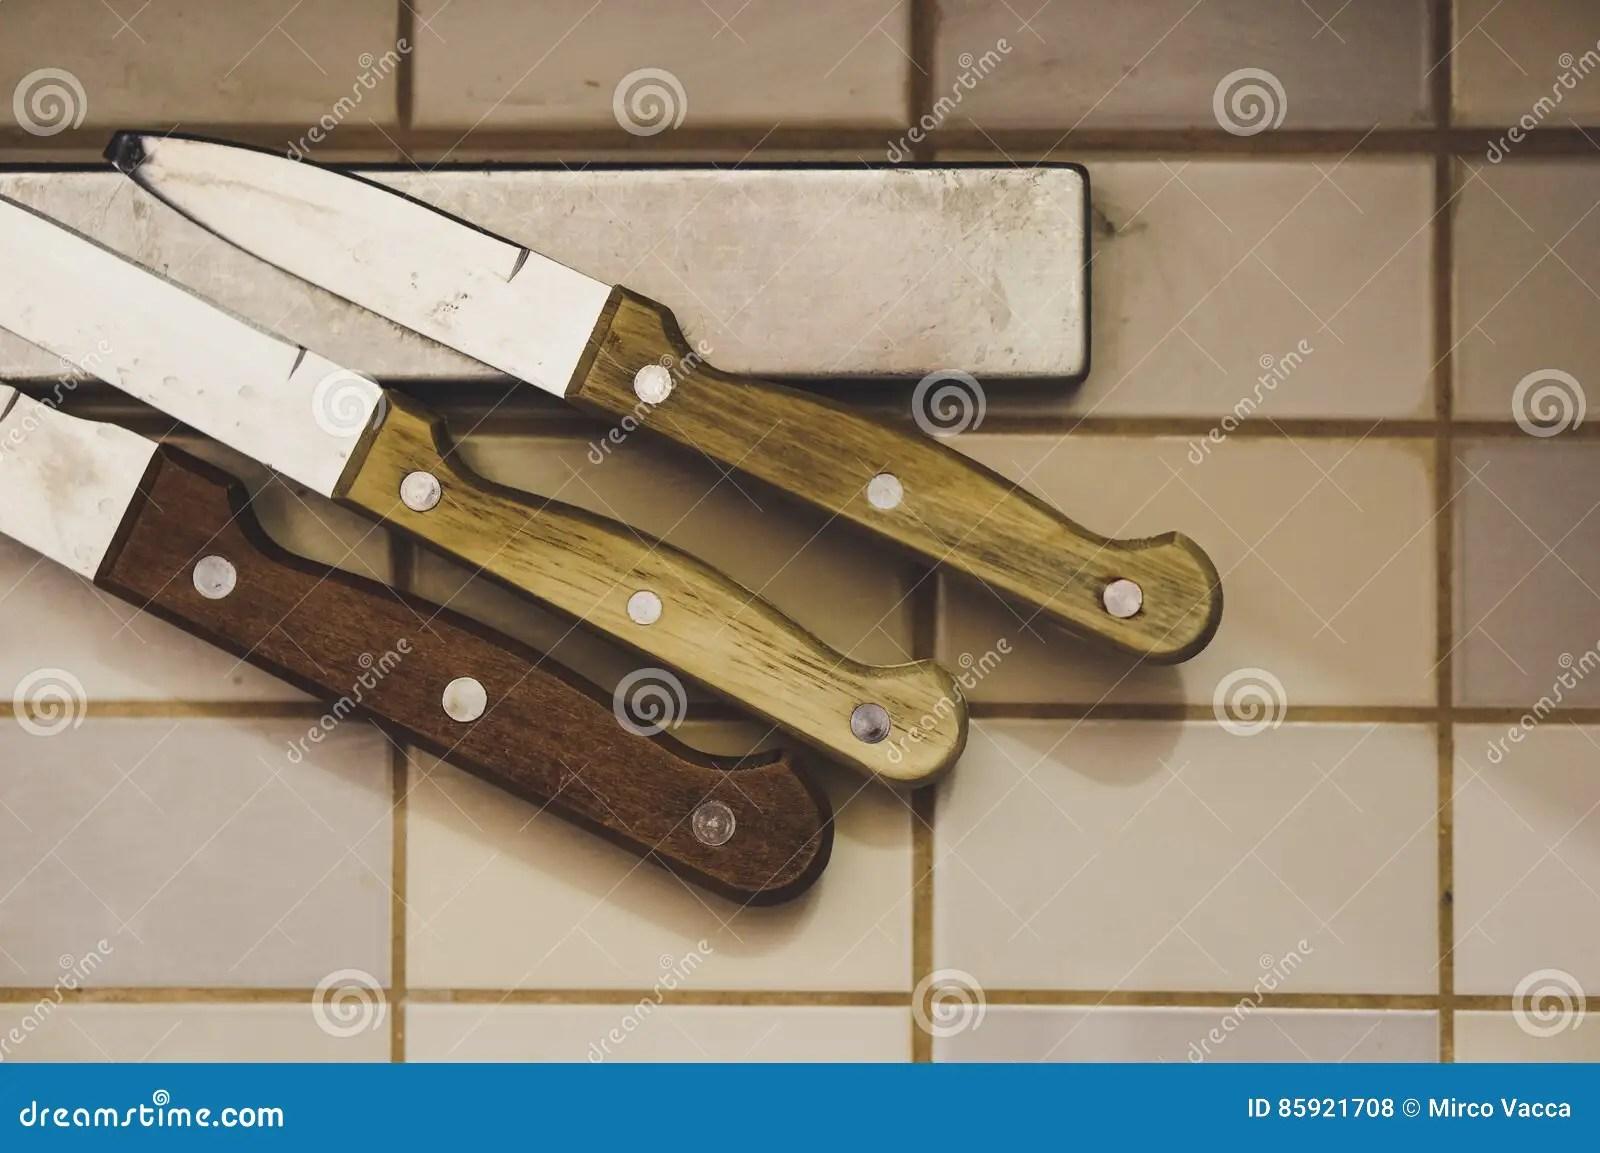 kitchen knife magnet 2x3 rug 在磁铁的厨刀库存照片 图片包括有金属 工具 不锈 设备 国内 虚拟 有木把柄的三把厨刀在磁铁在软的焦点